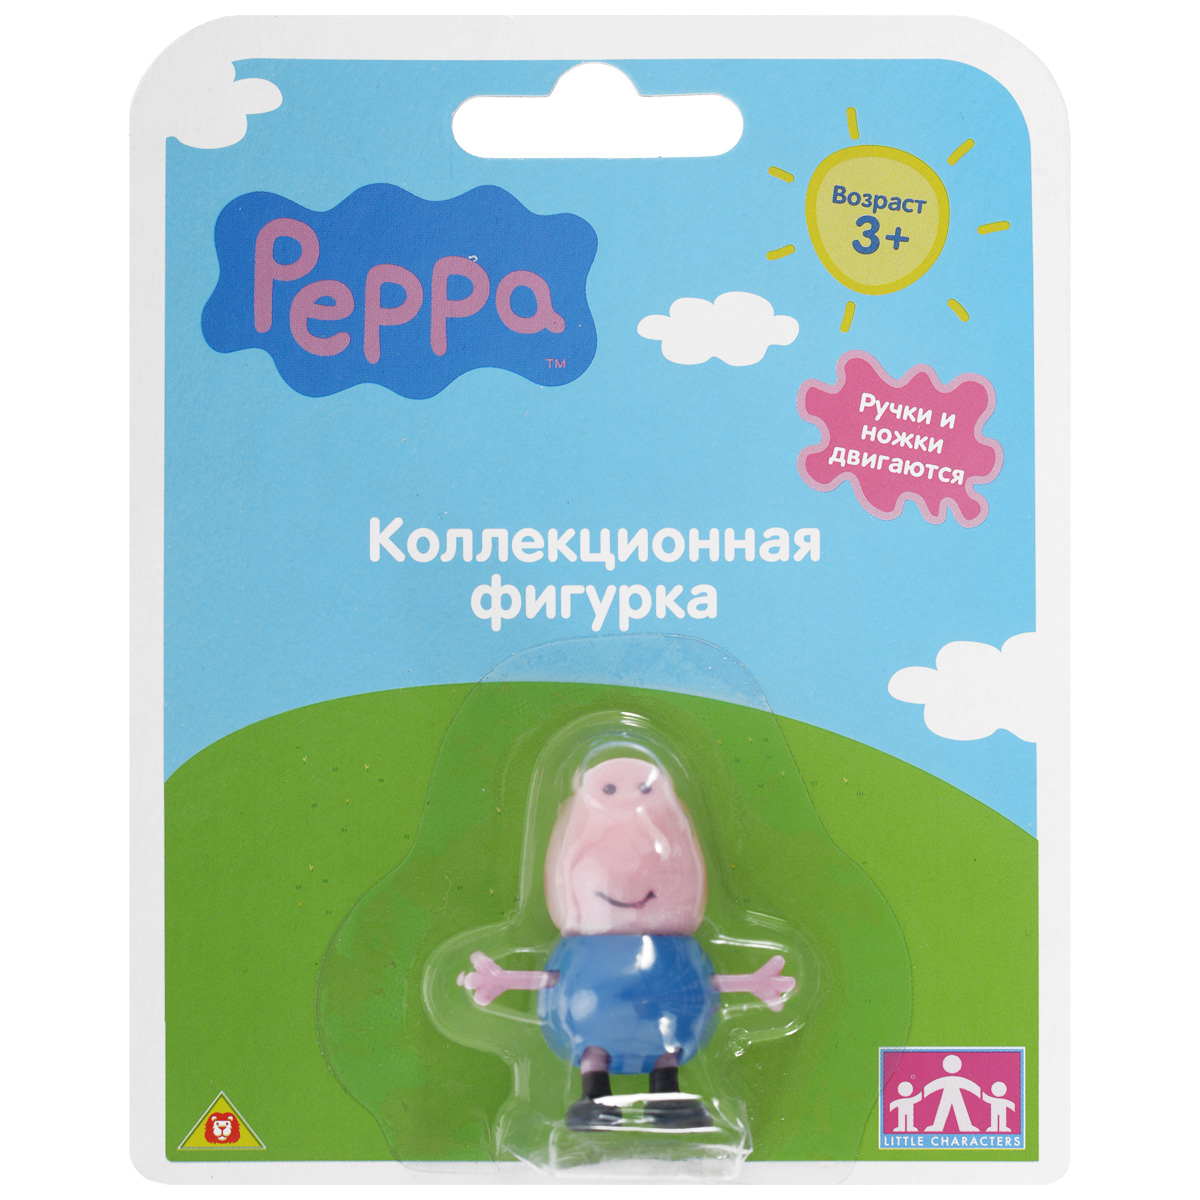 Фигурка Peppa Pig Любимый персонаж. Хрюша, цвет: синий